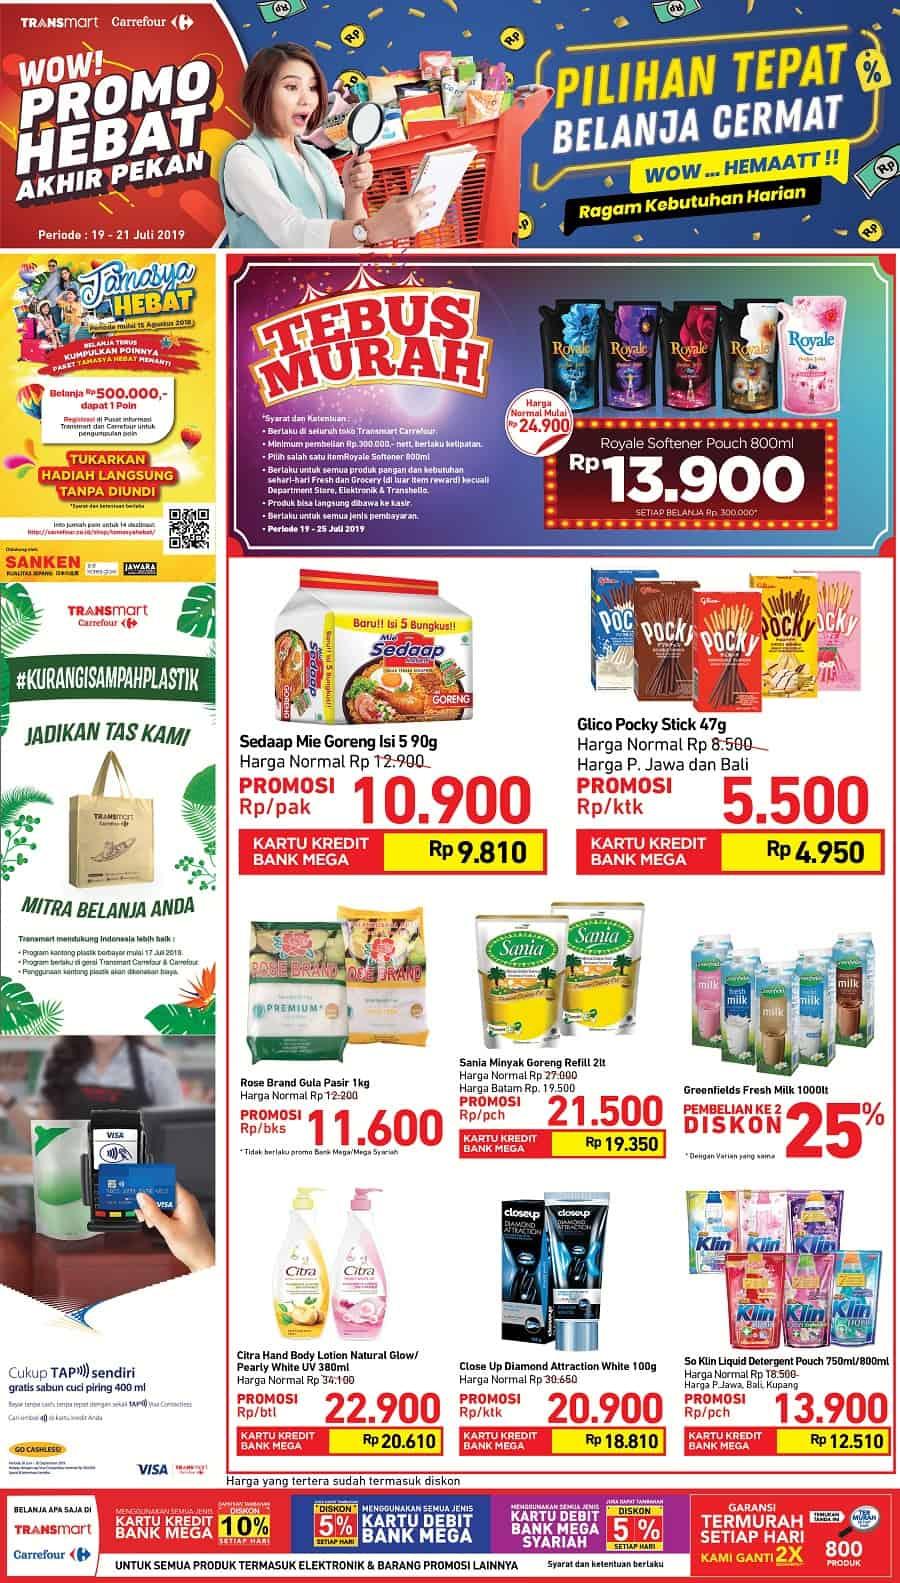 Katalog Promo Carrefour Weekend Promo periode 19-21 Juli 2019